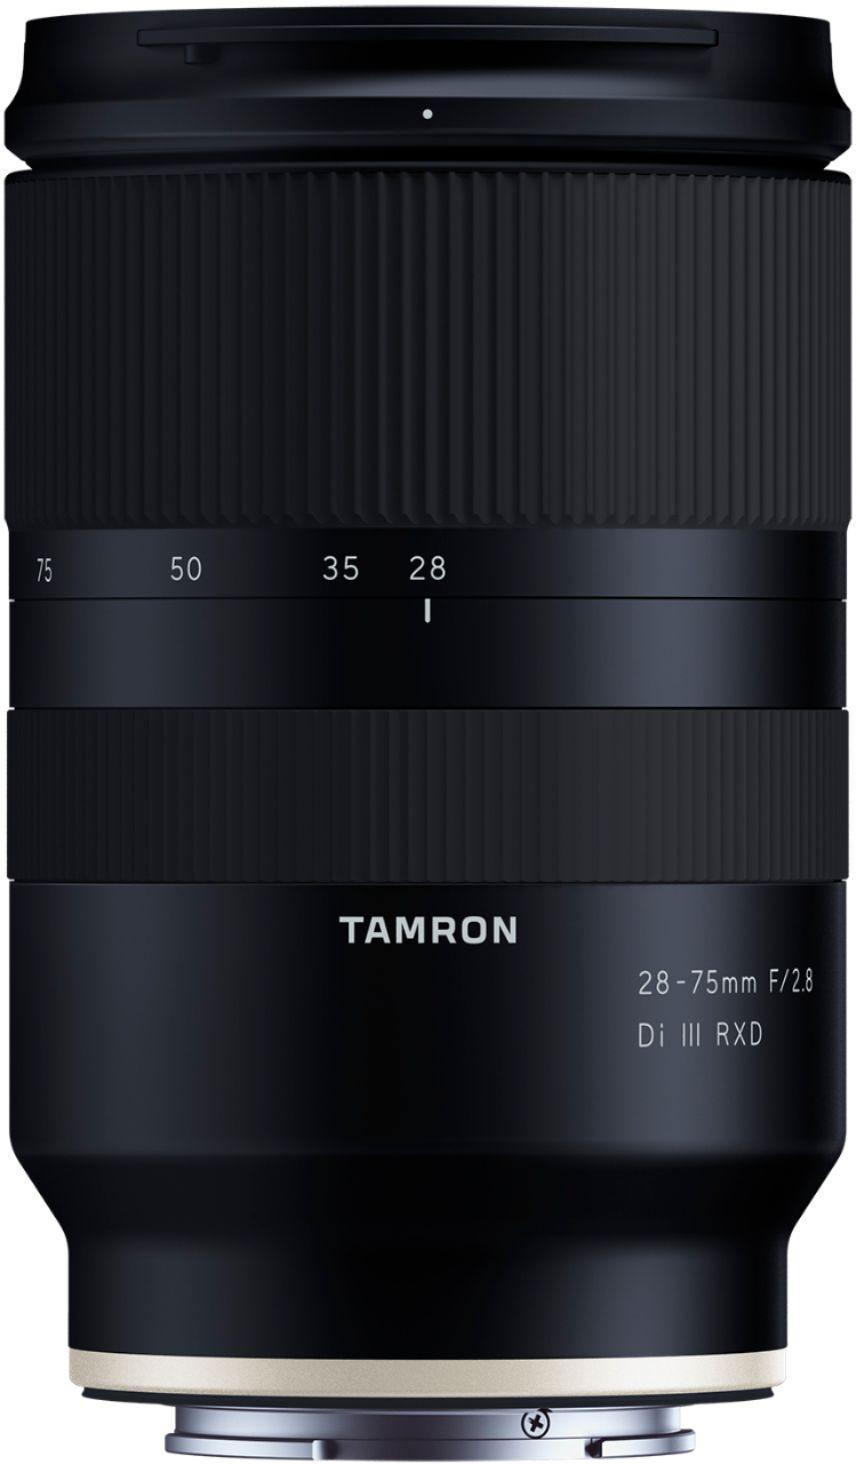 Tamron 28-75mm F/2.8 $729 B&H Edu Special